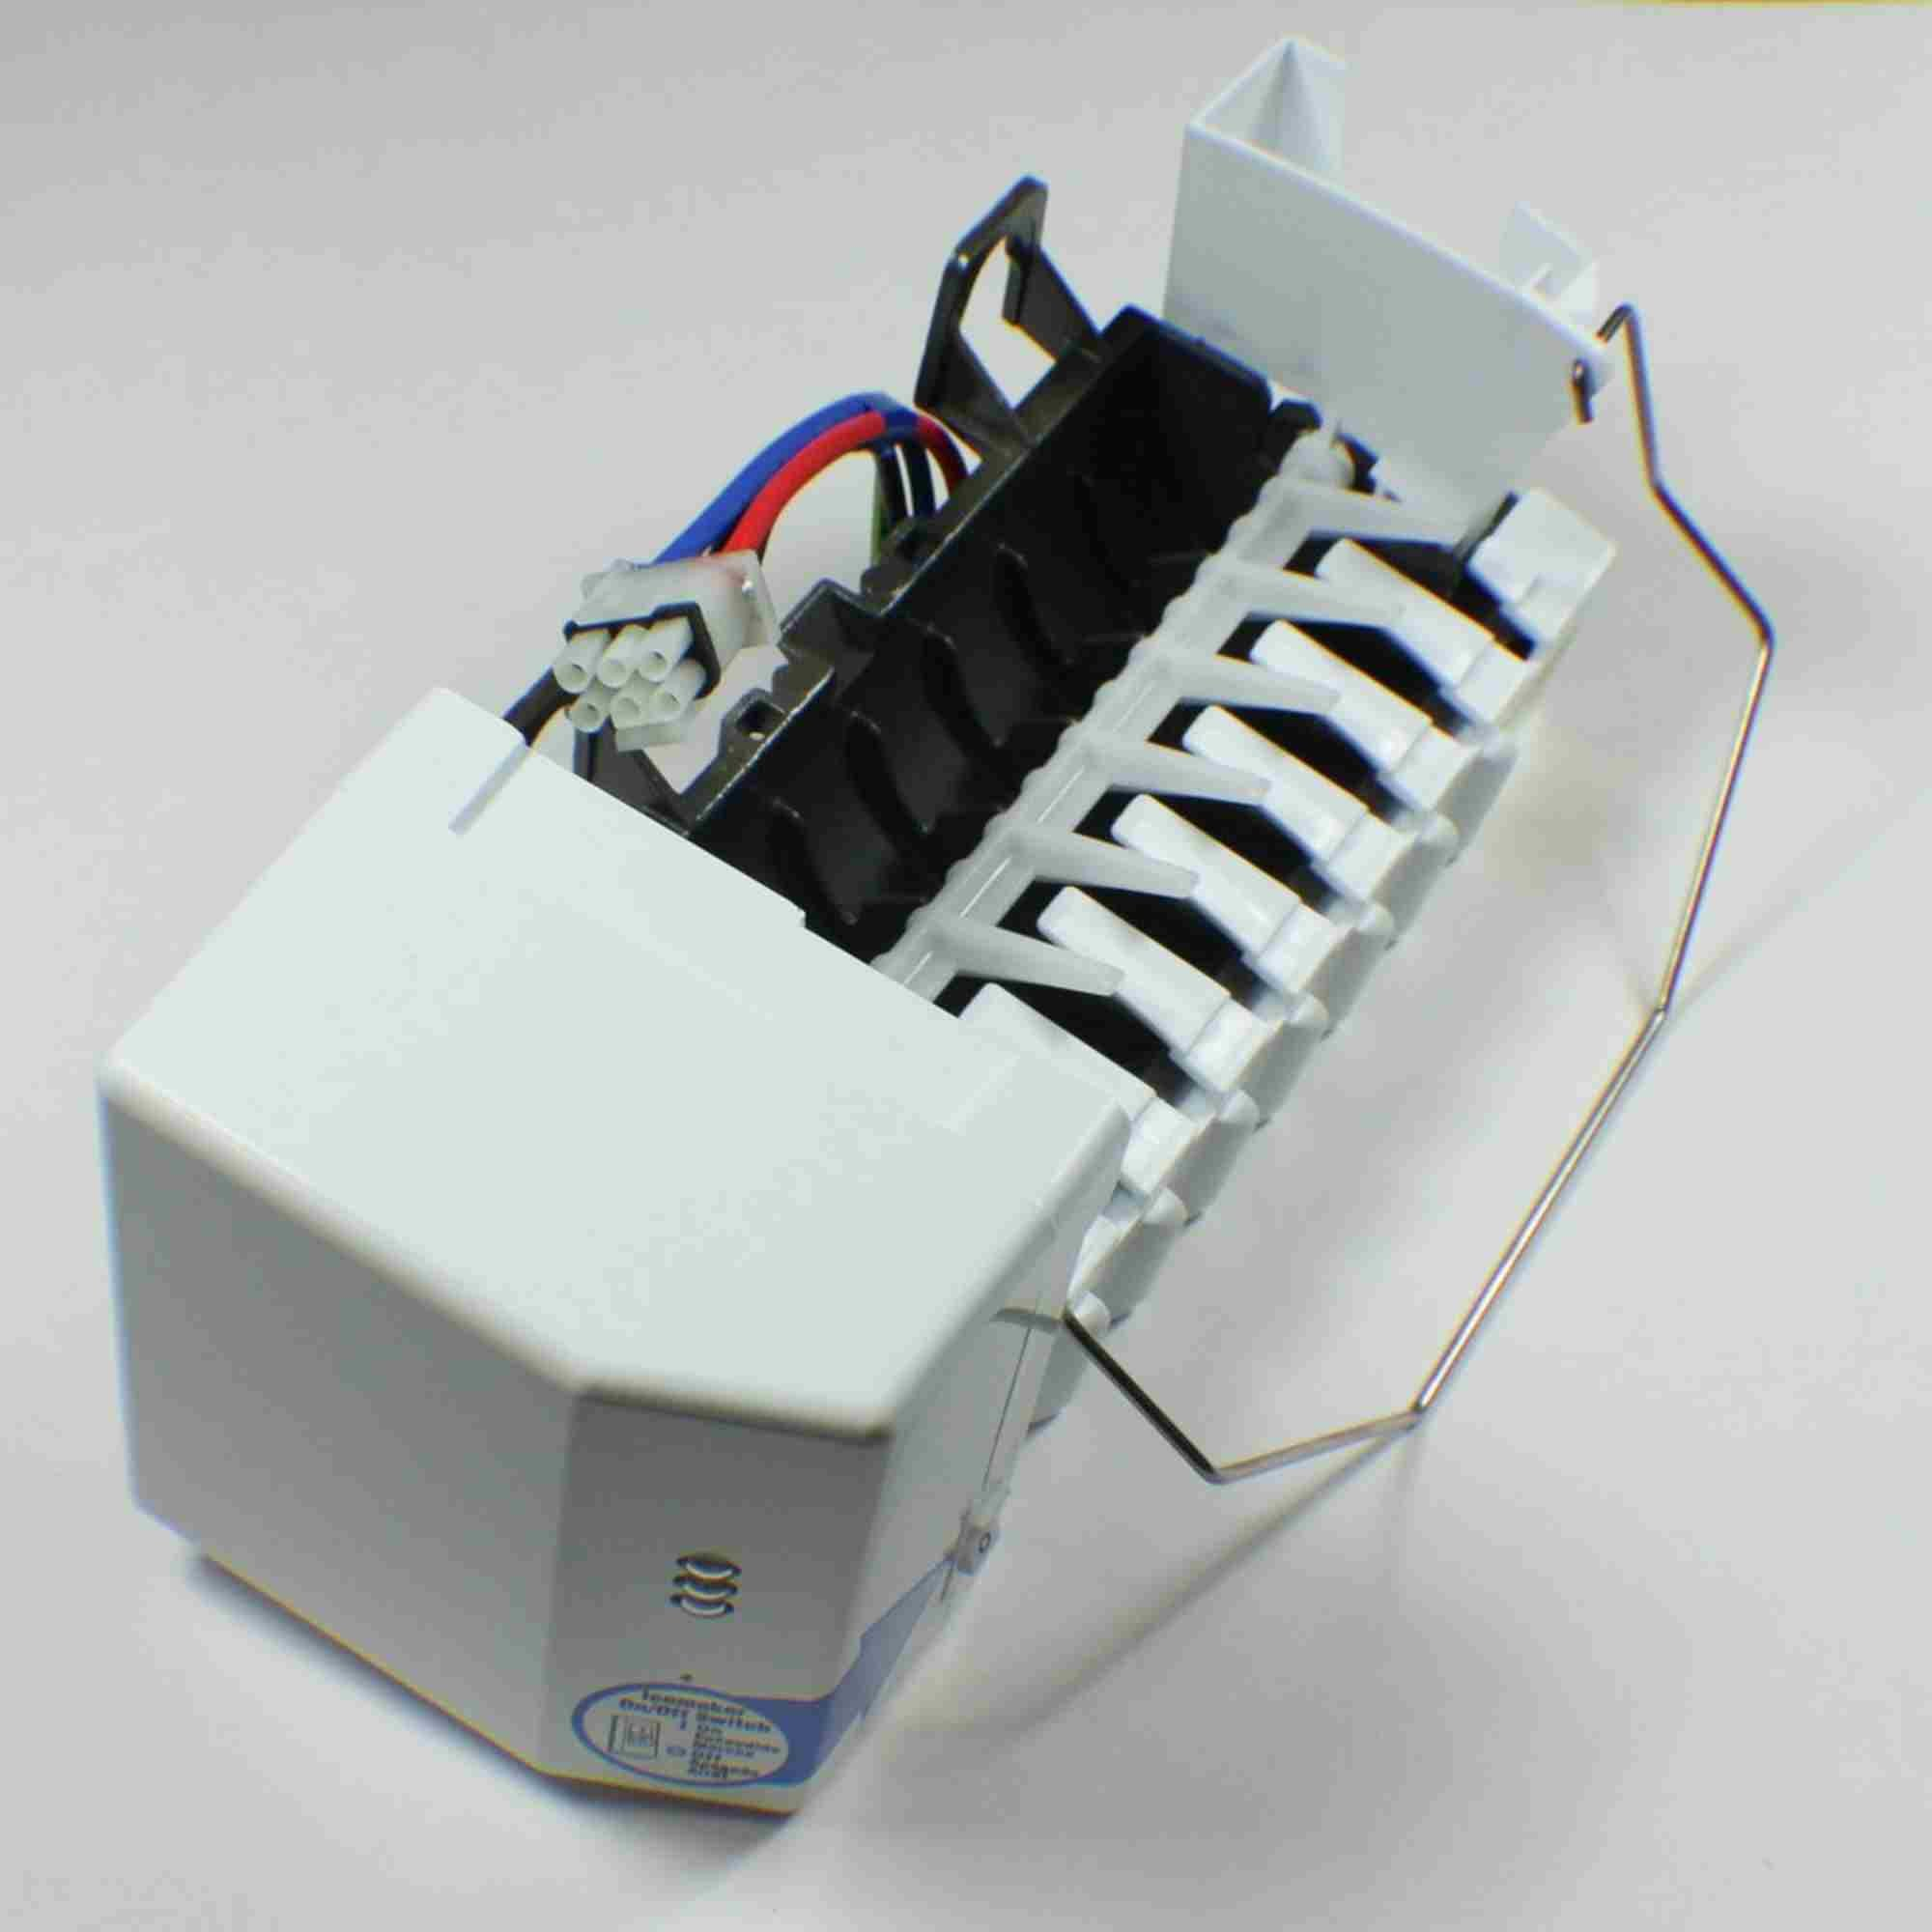 LG OEM Original Part: 5989JA0002Y Refrigerator Ice Maker Assembly Kit by LG